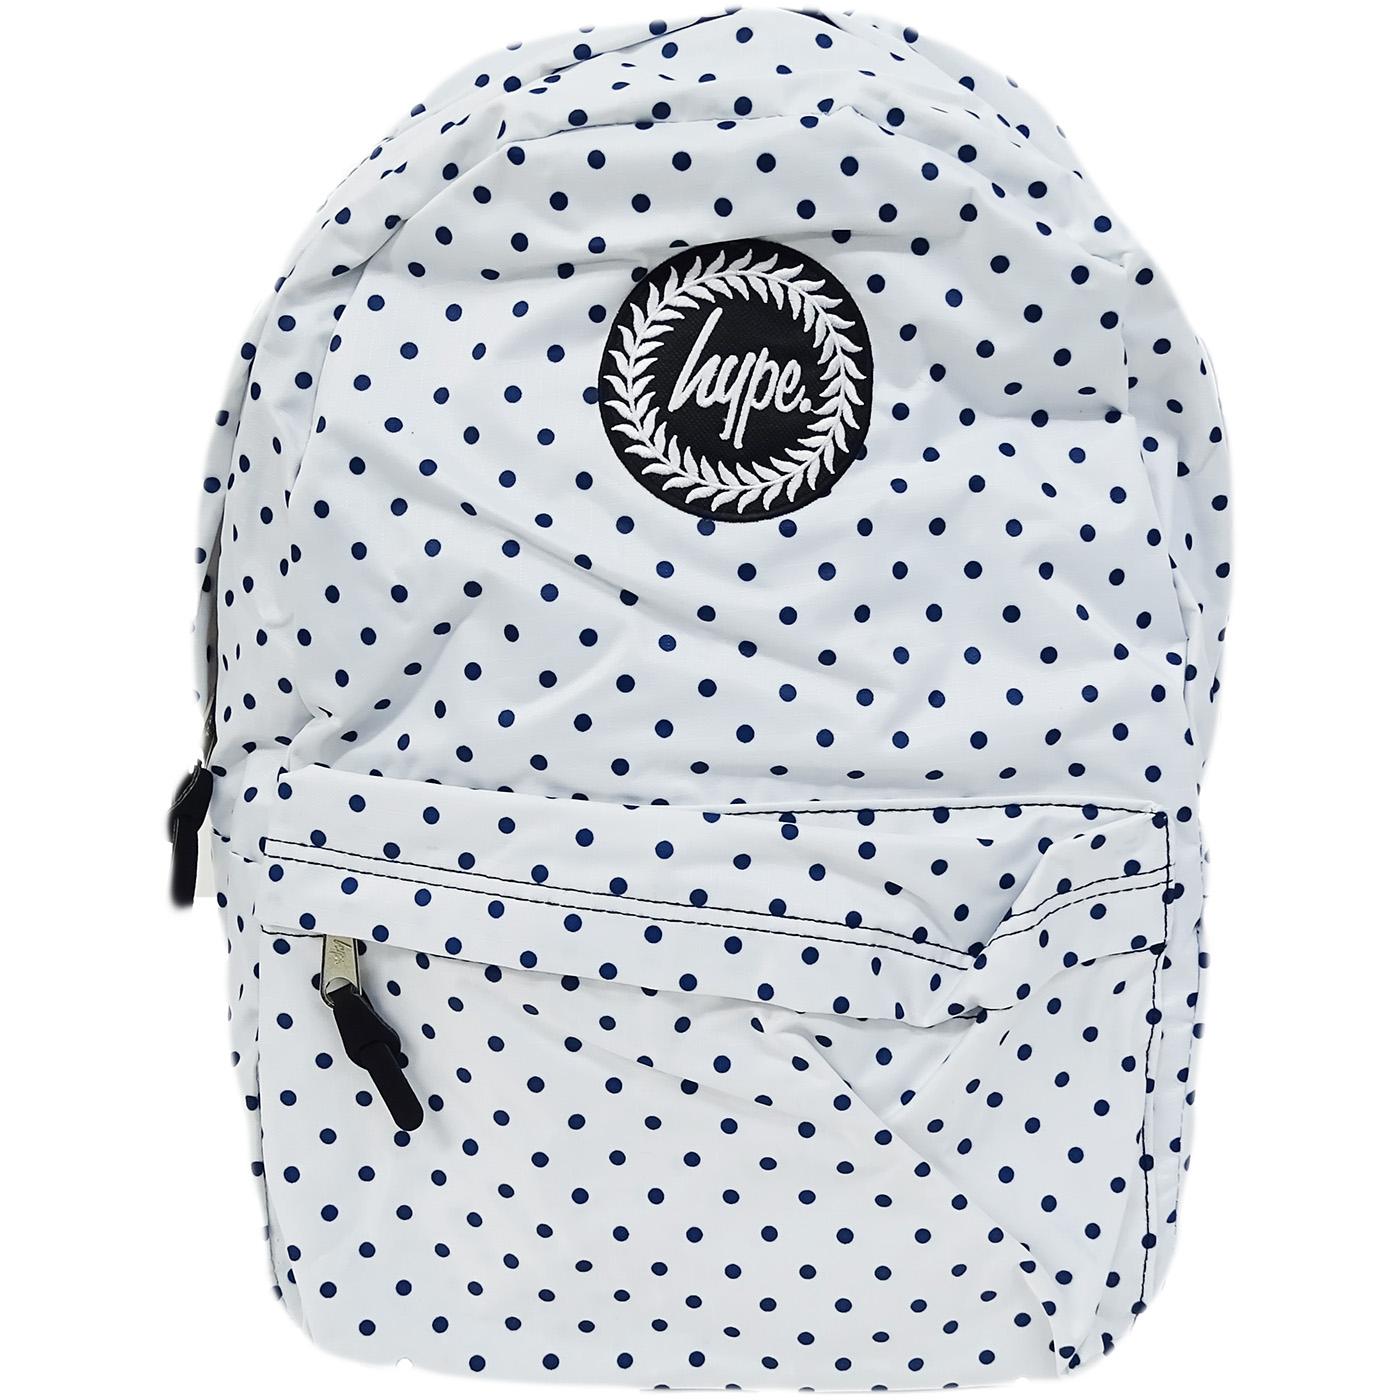 Hype Polka with Navy Bag - Boys / Girls Backpack, Rucksack - Reversible